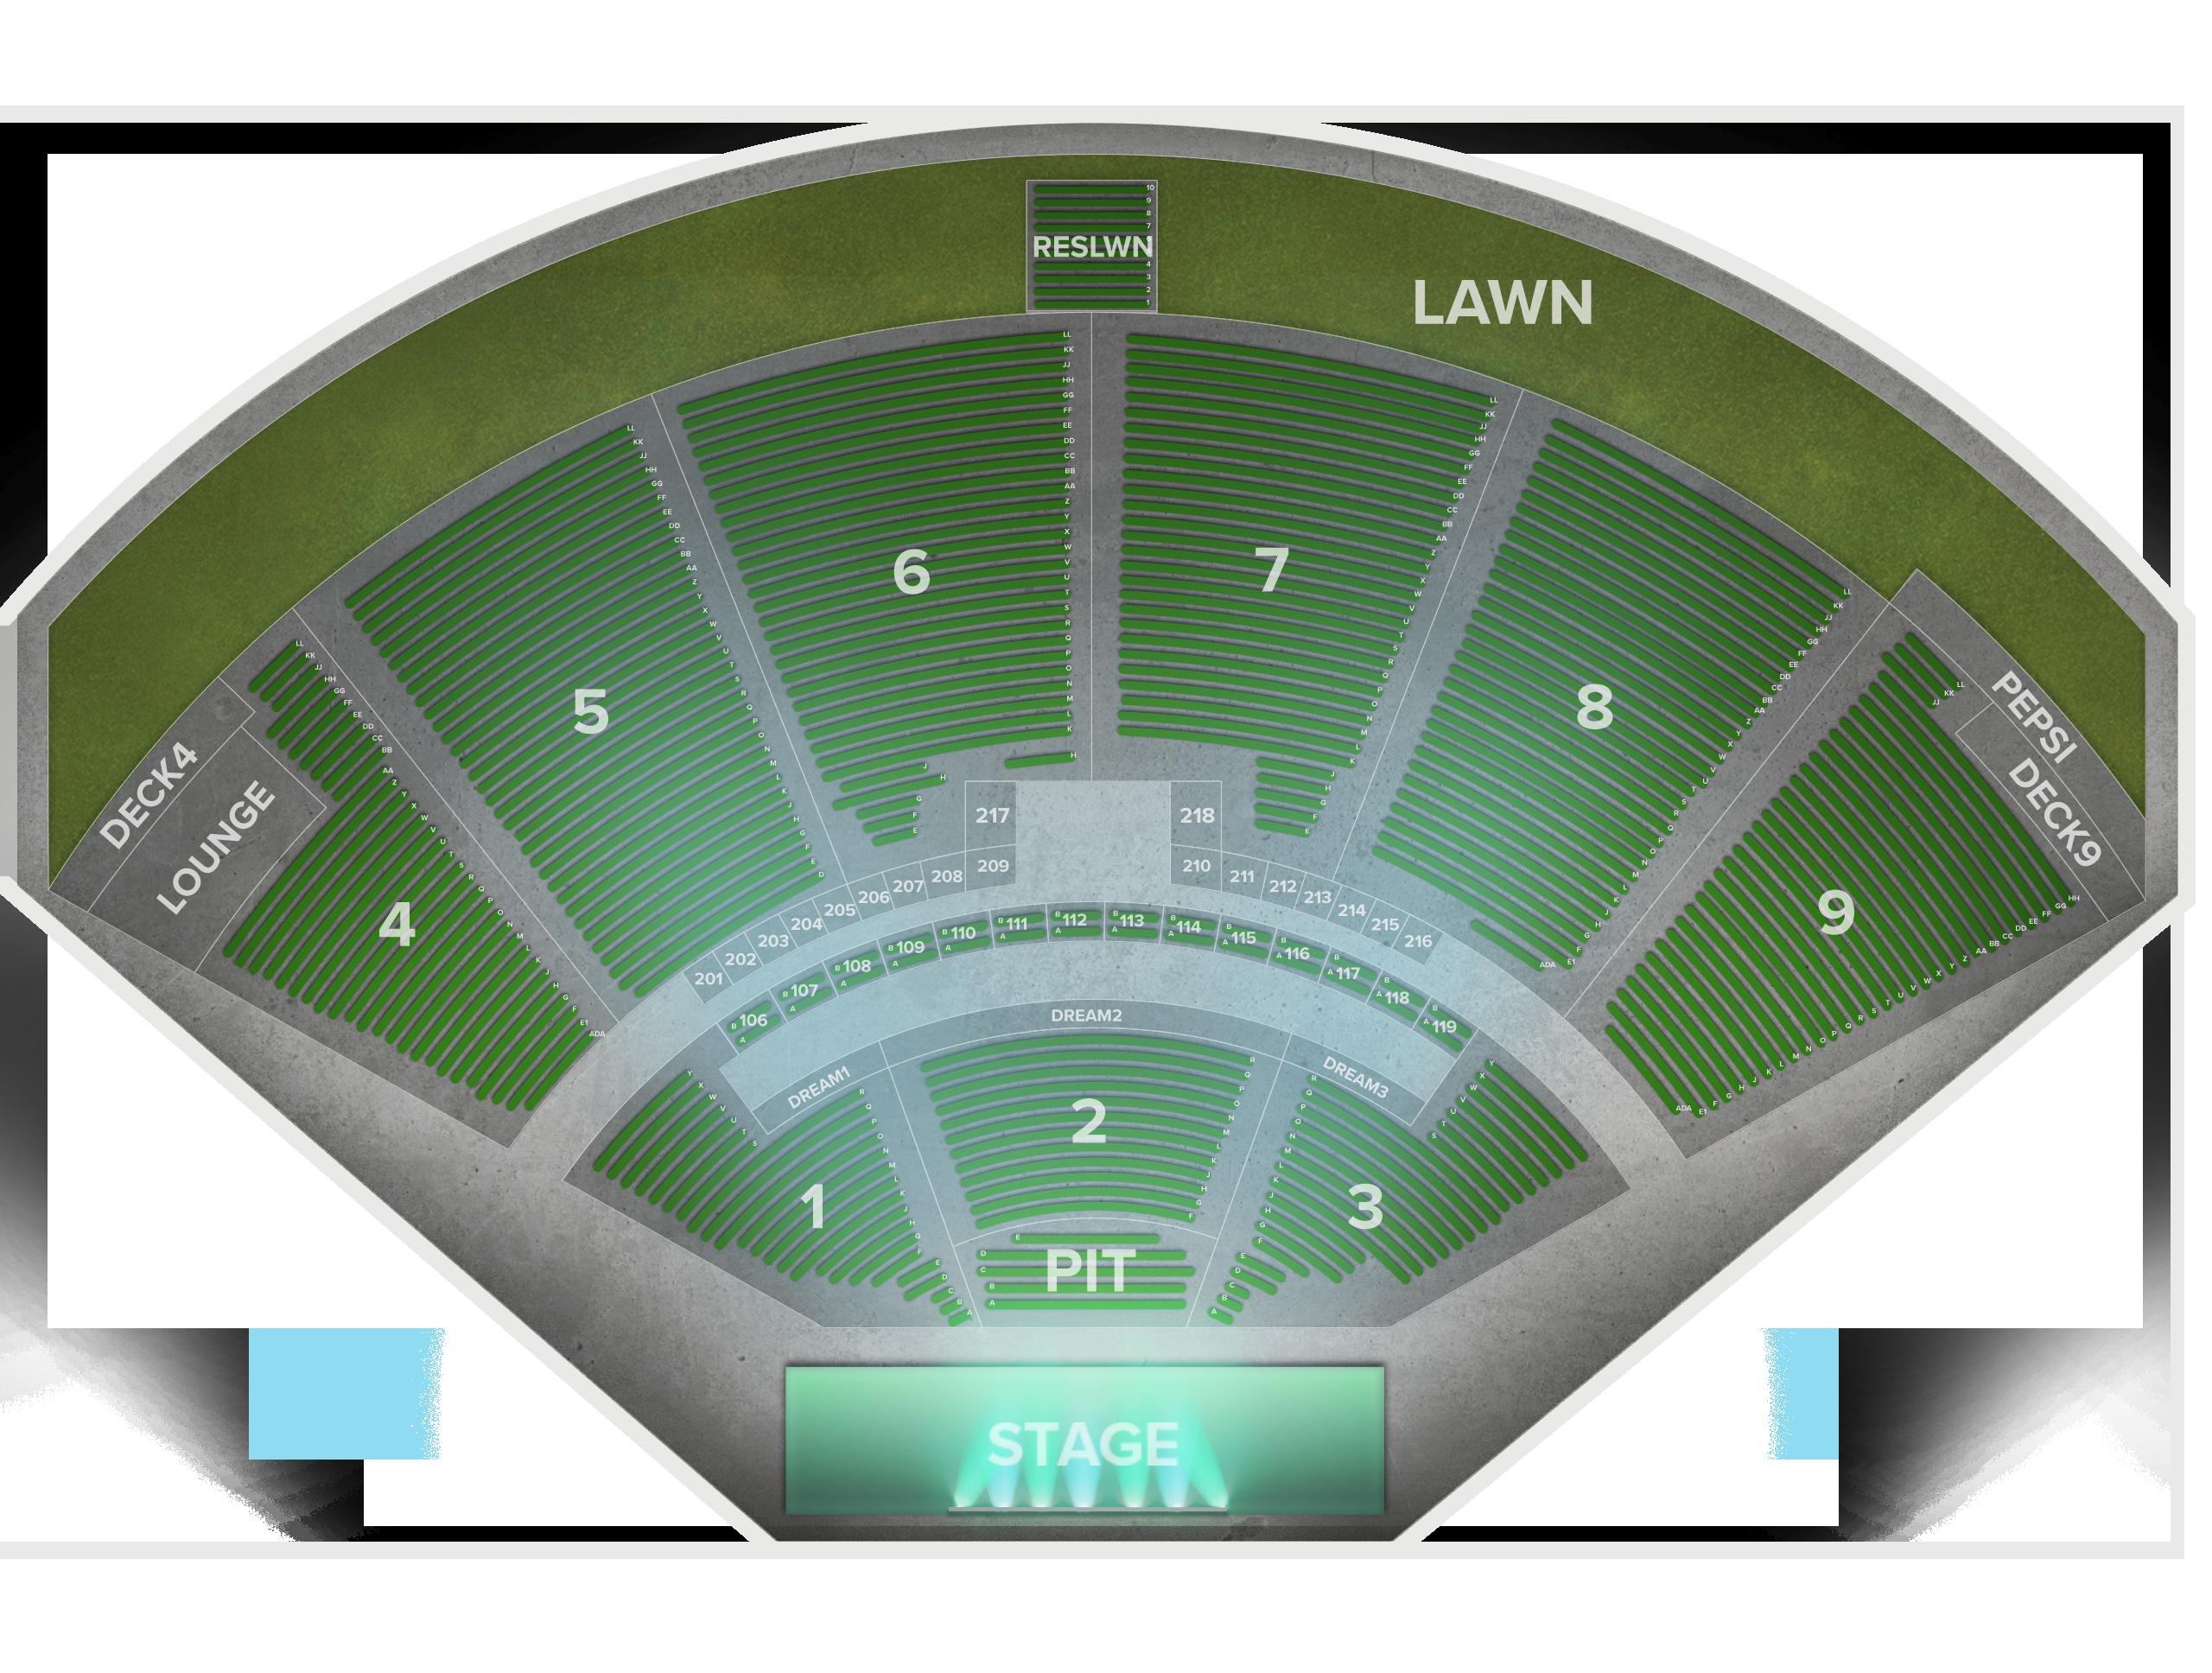 KeyBank Pavilion Tickets